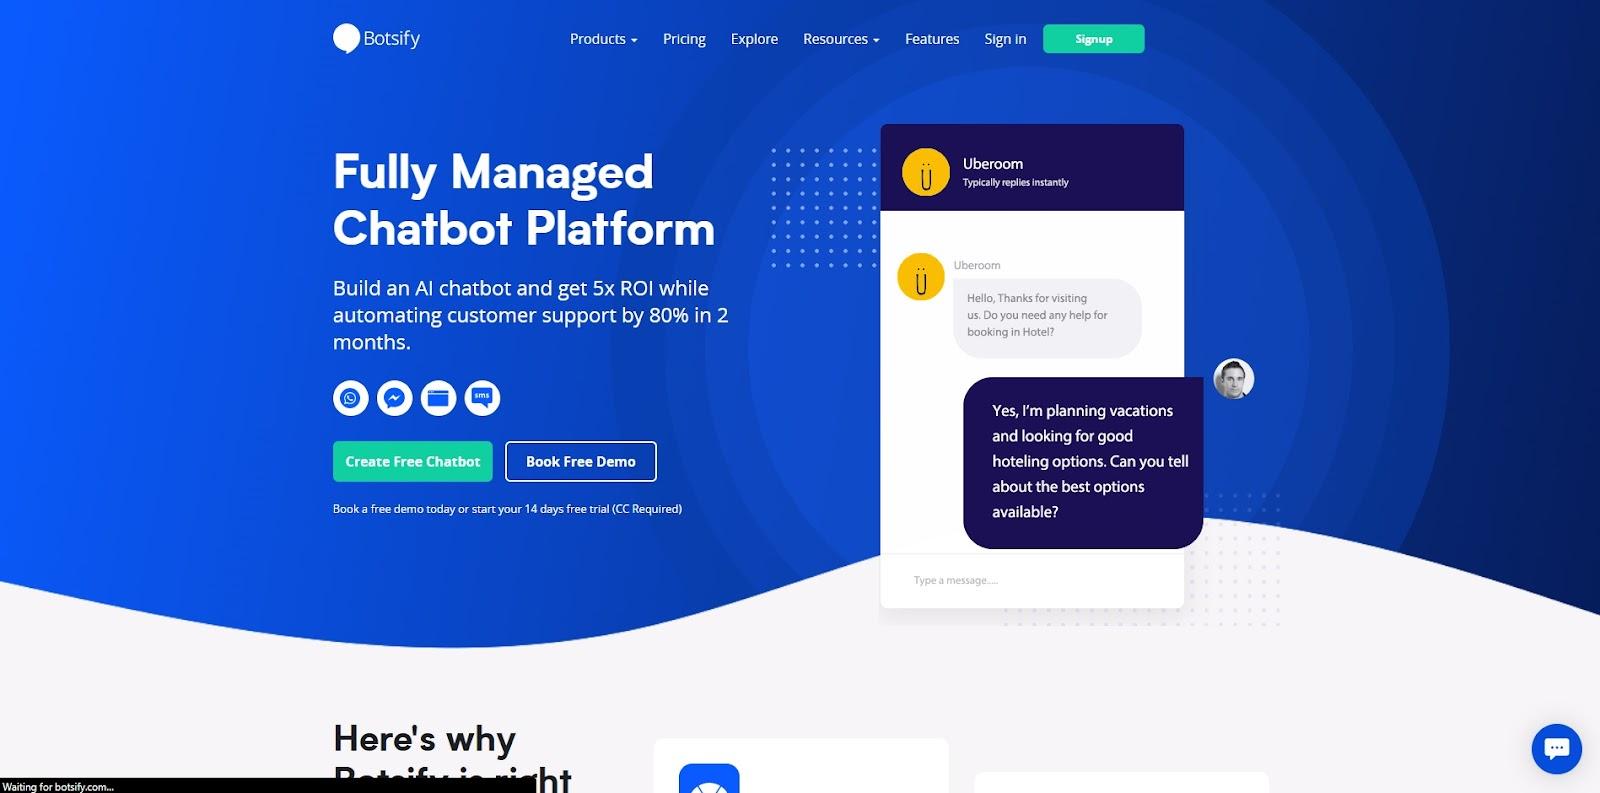 botsify homepage